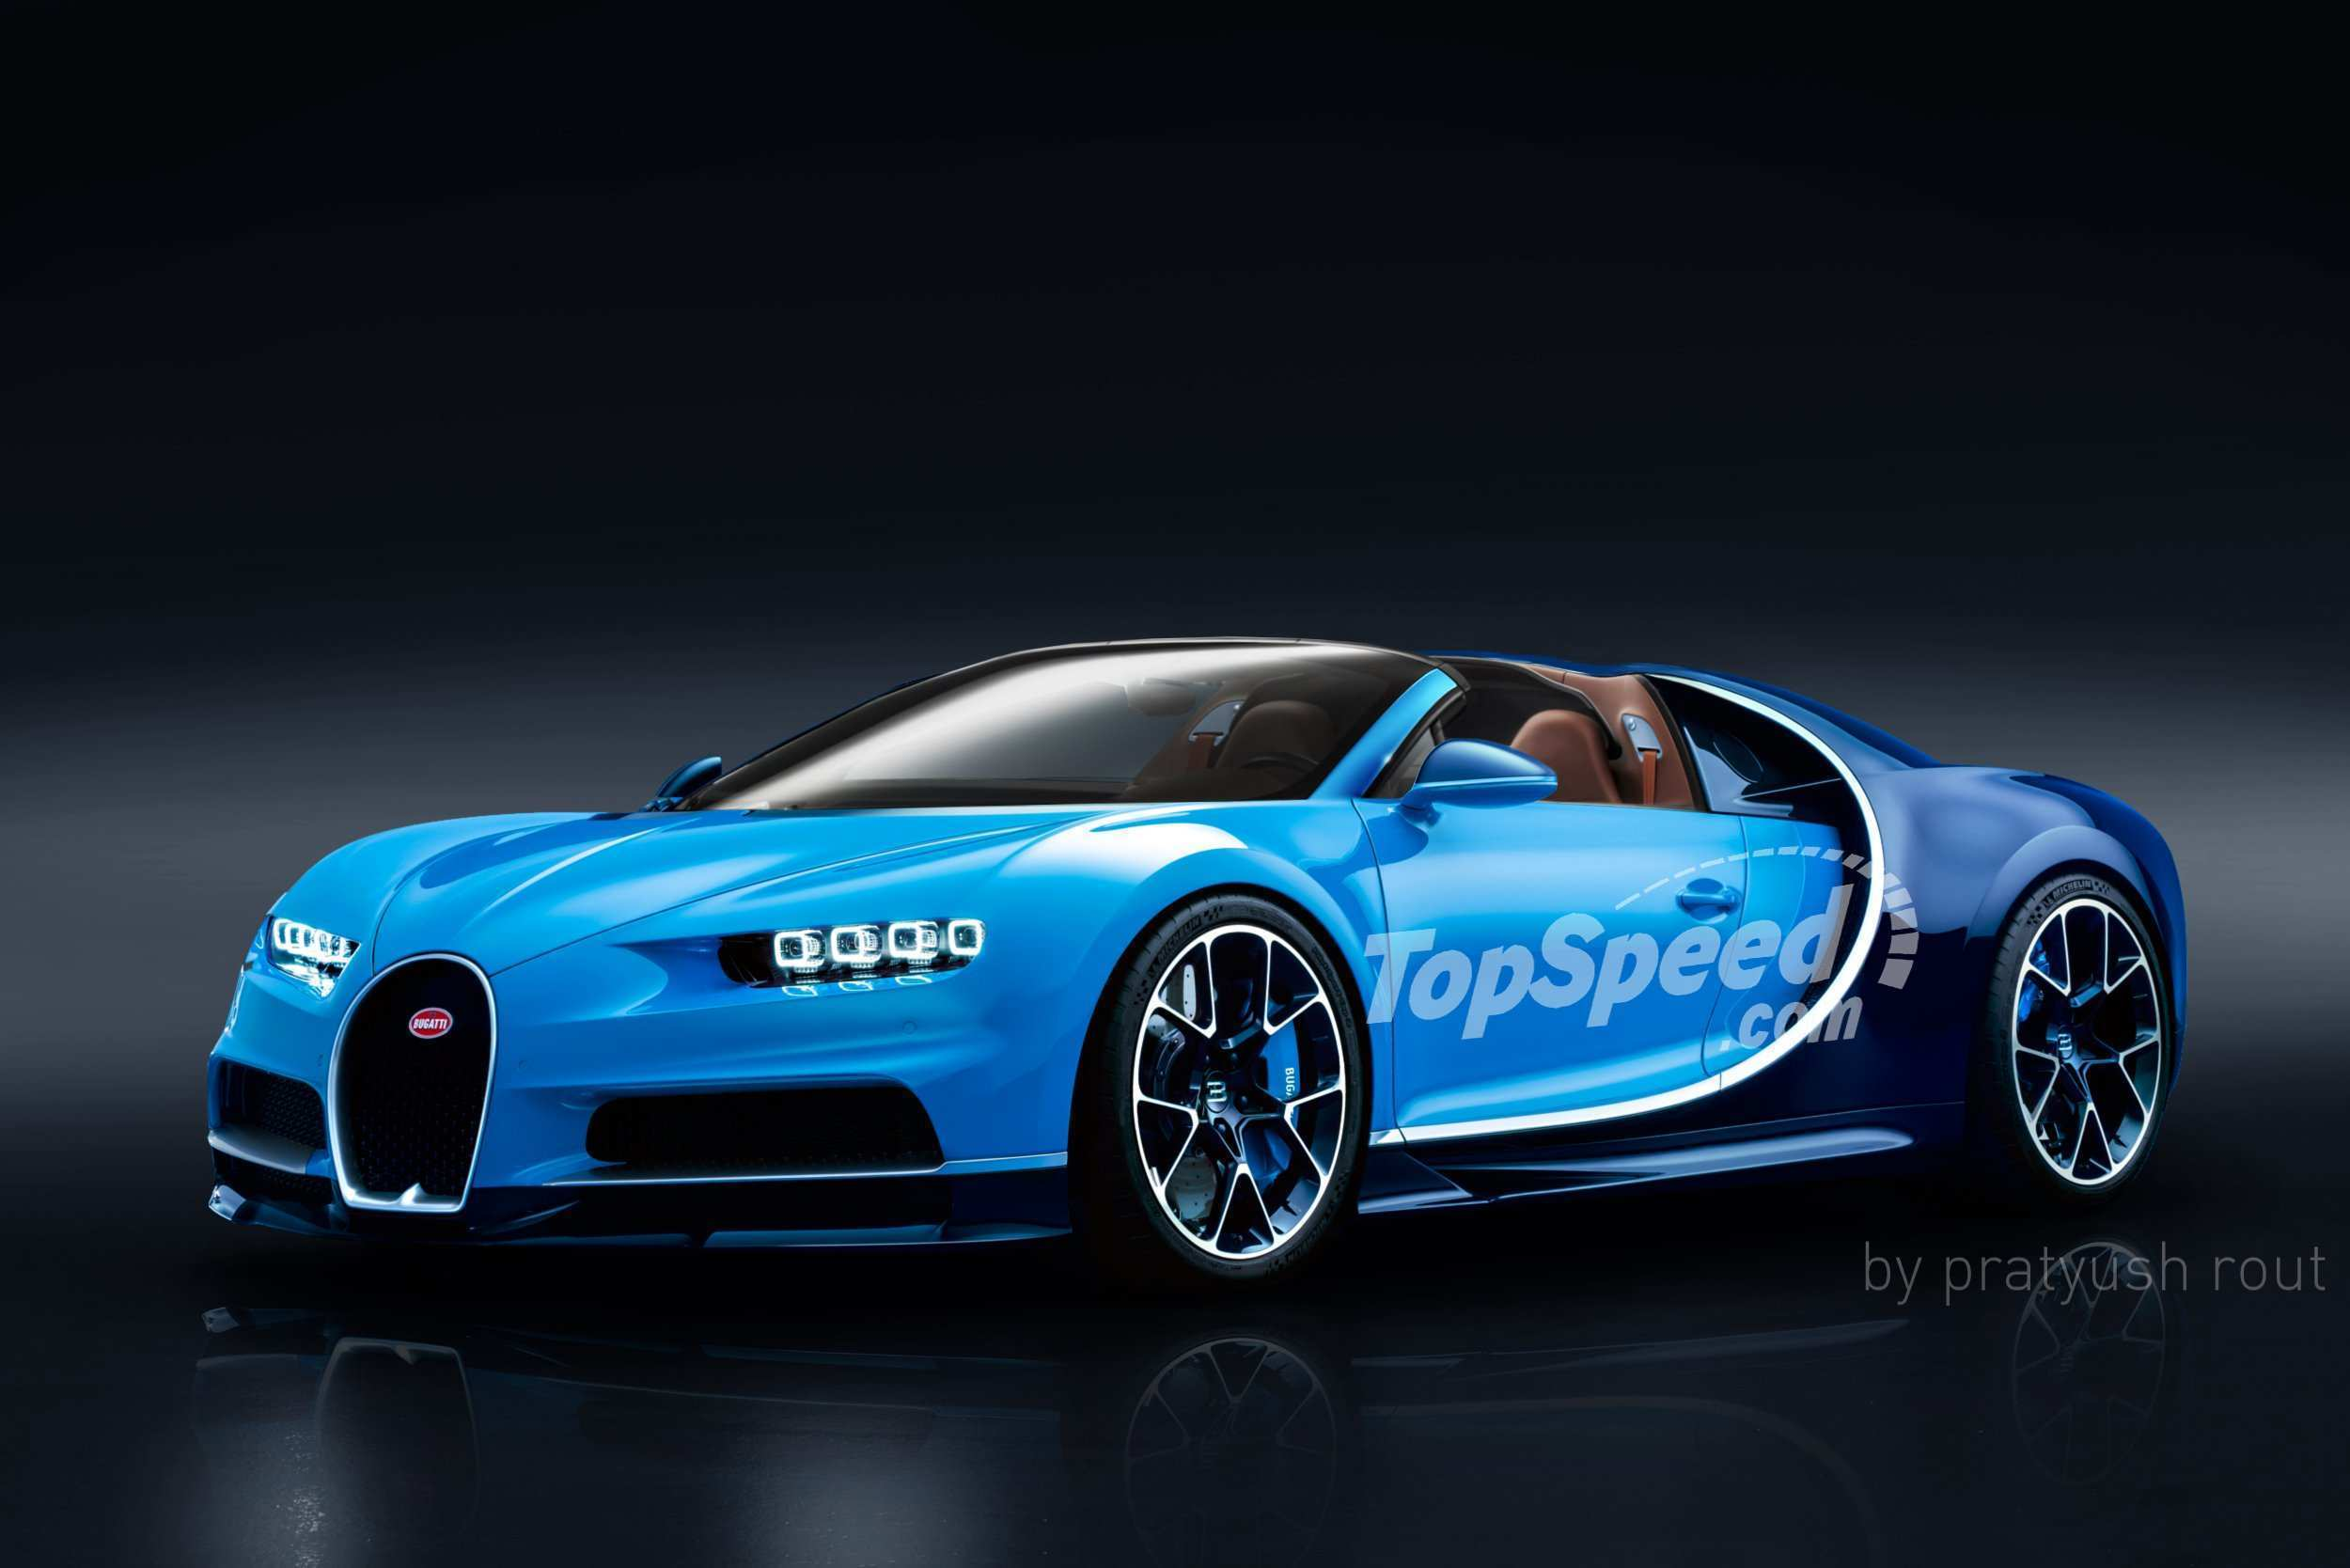 45 The 2019 Bugatti Chiron Sport Top Speed Interior for 2019 Bugatti Chiron Sport Top Speed